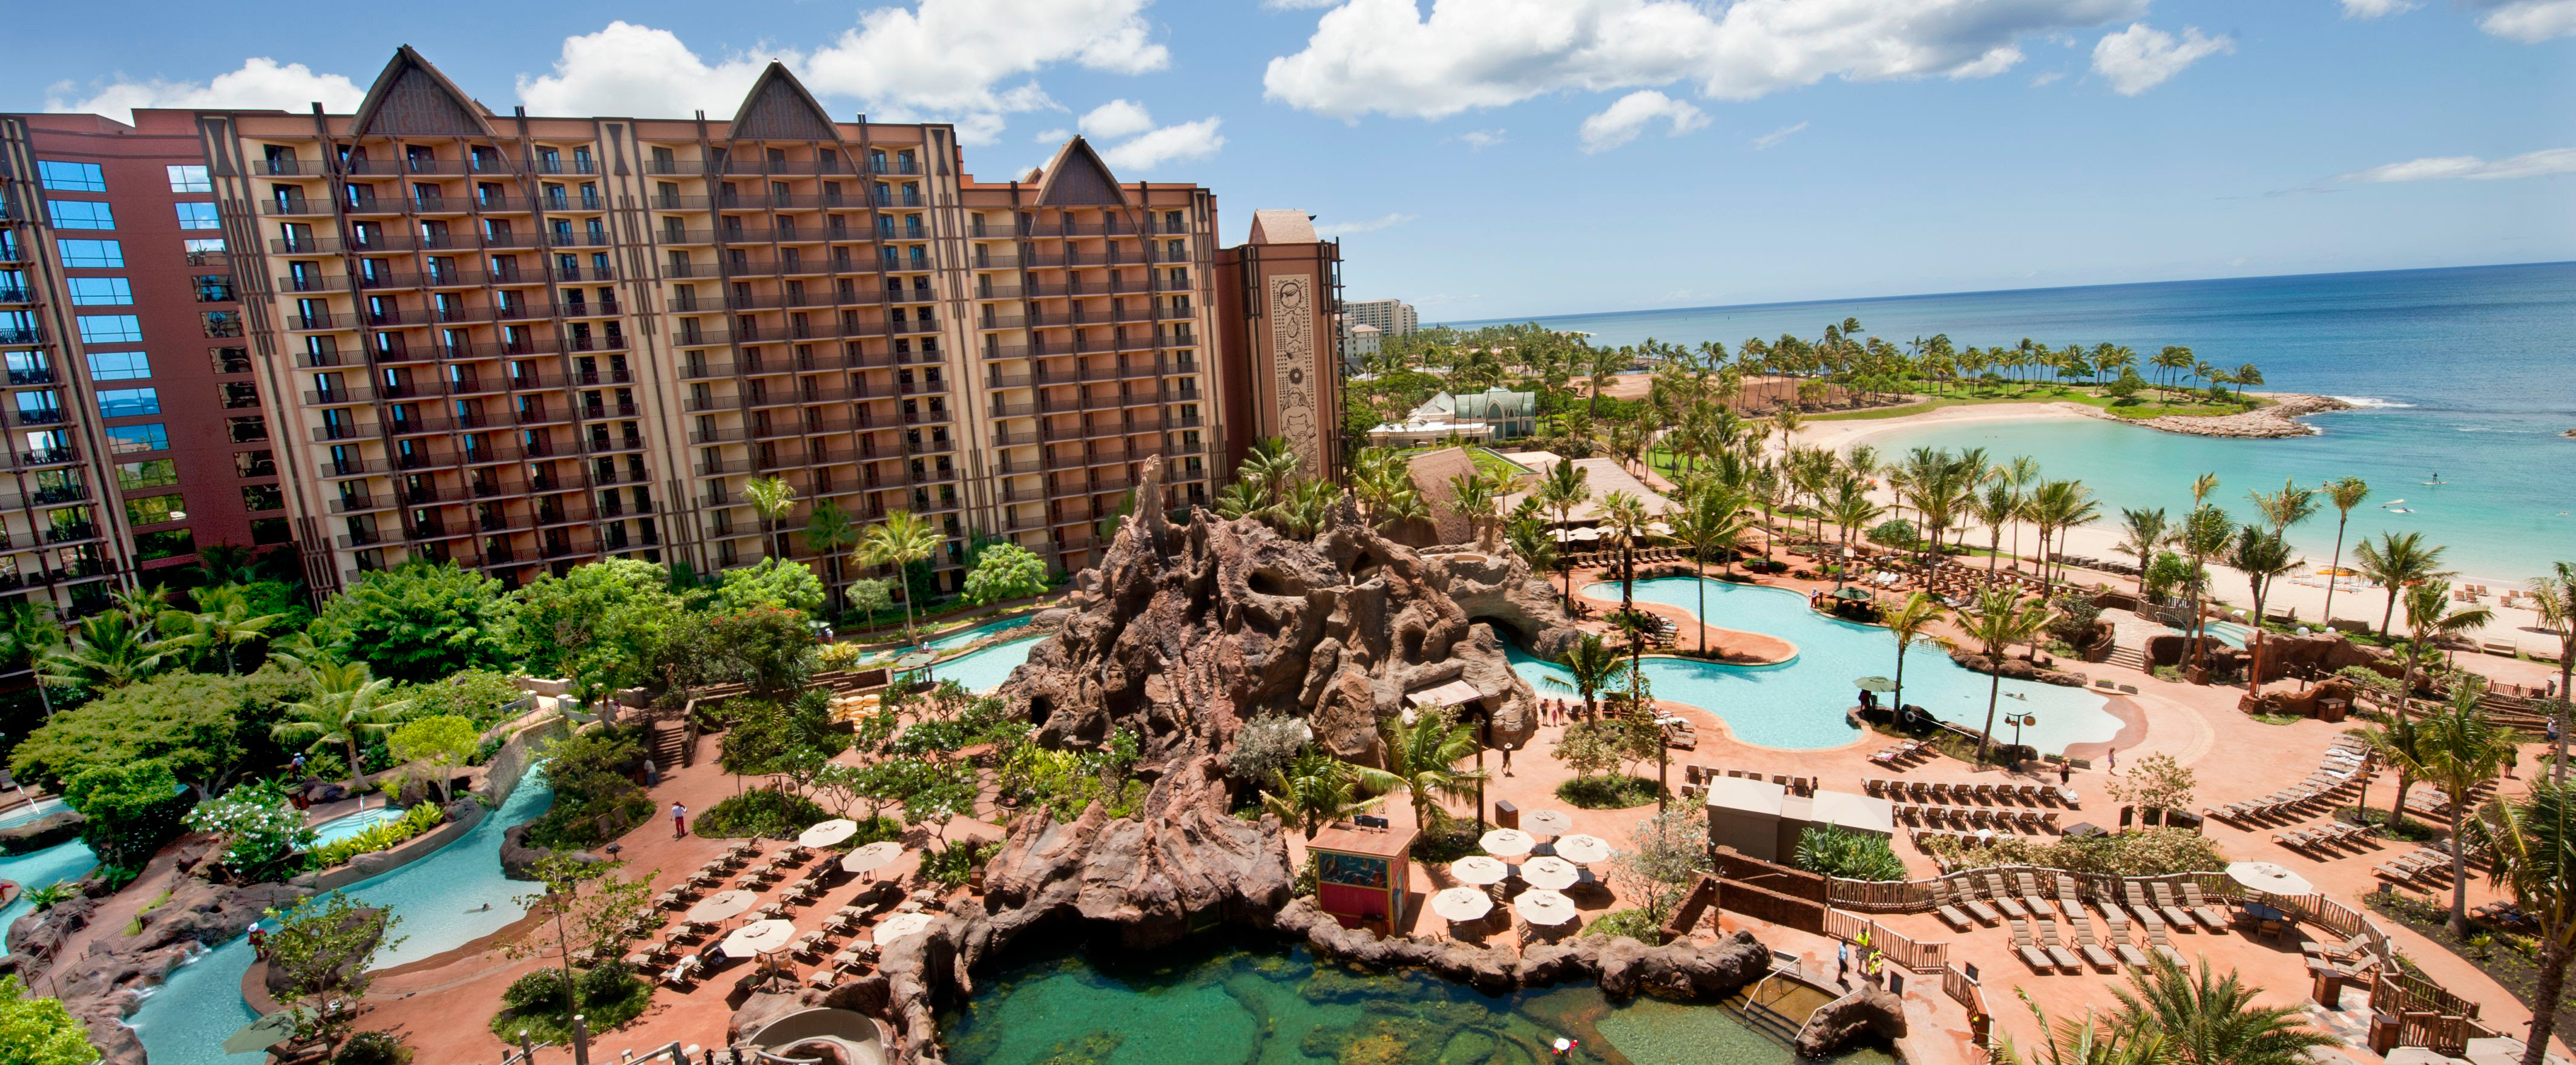 Aulani Resort Expansion  Aulani Hawaii Resort  Spa